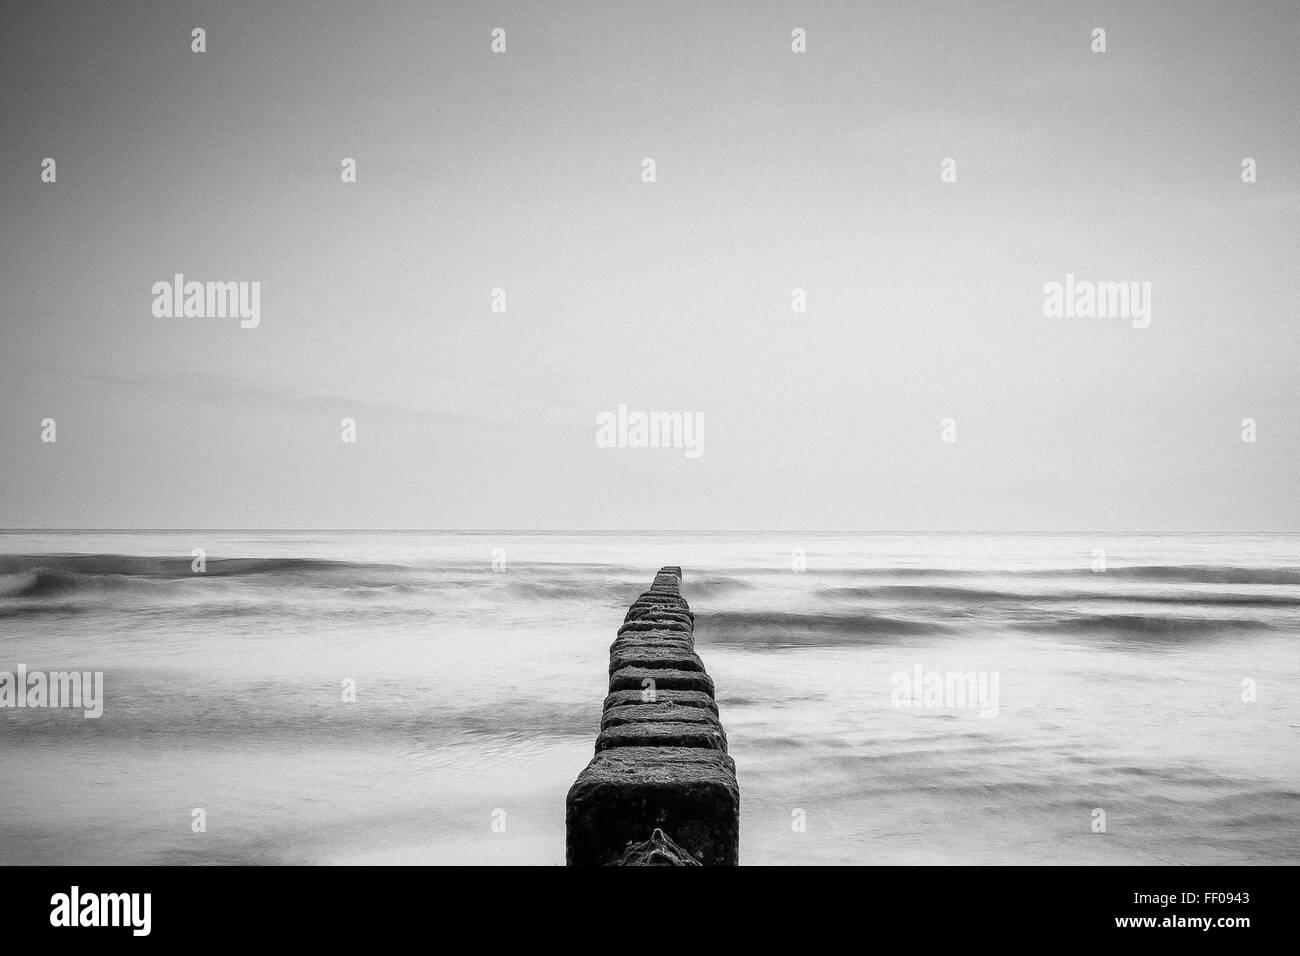 Océan Océan Monochrome monochrome Photo Stock